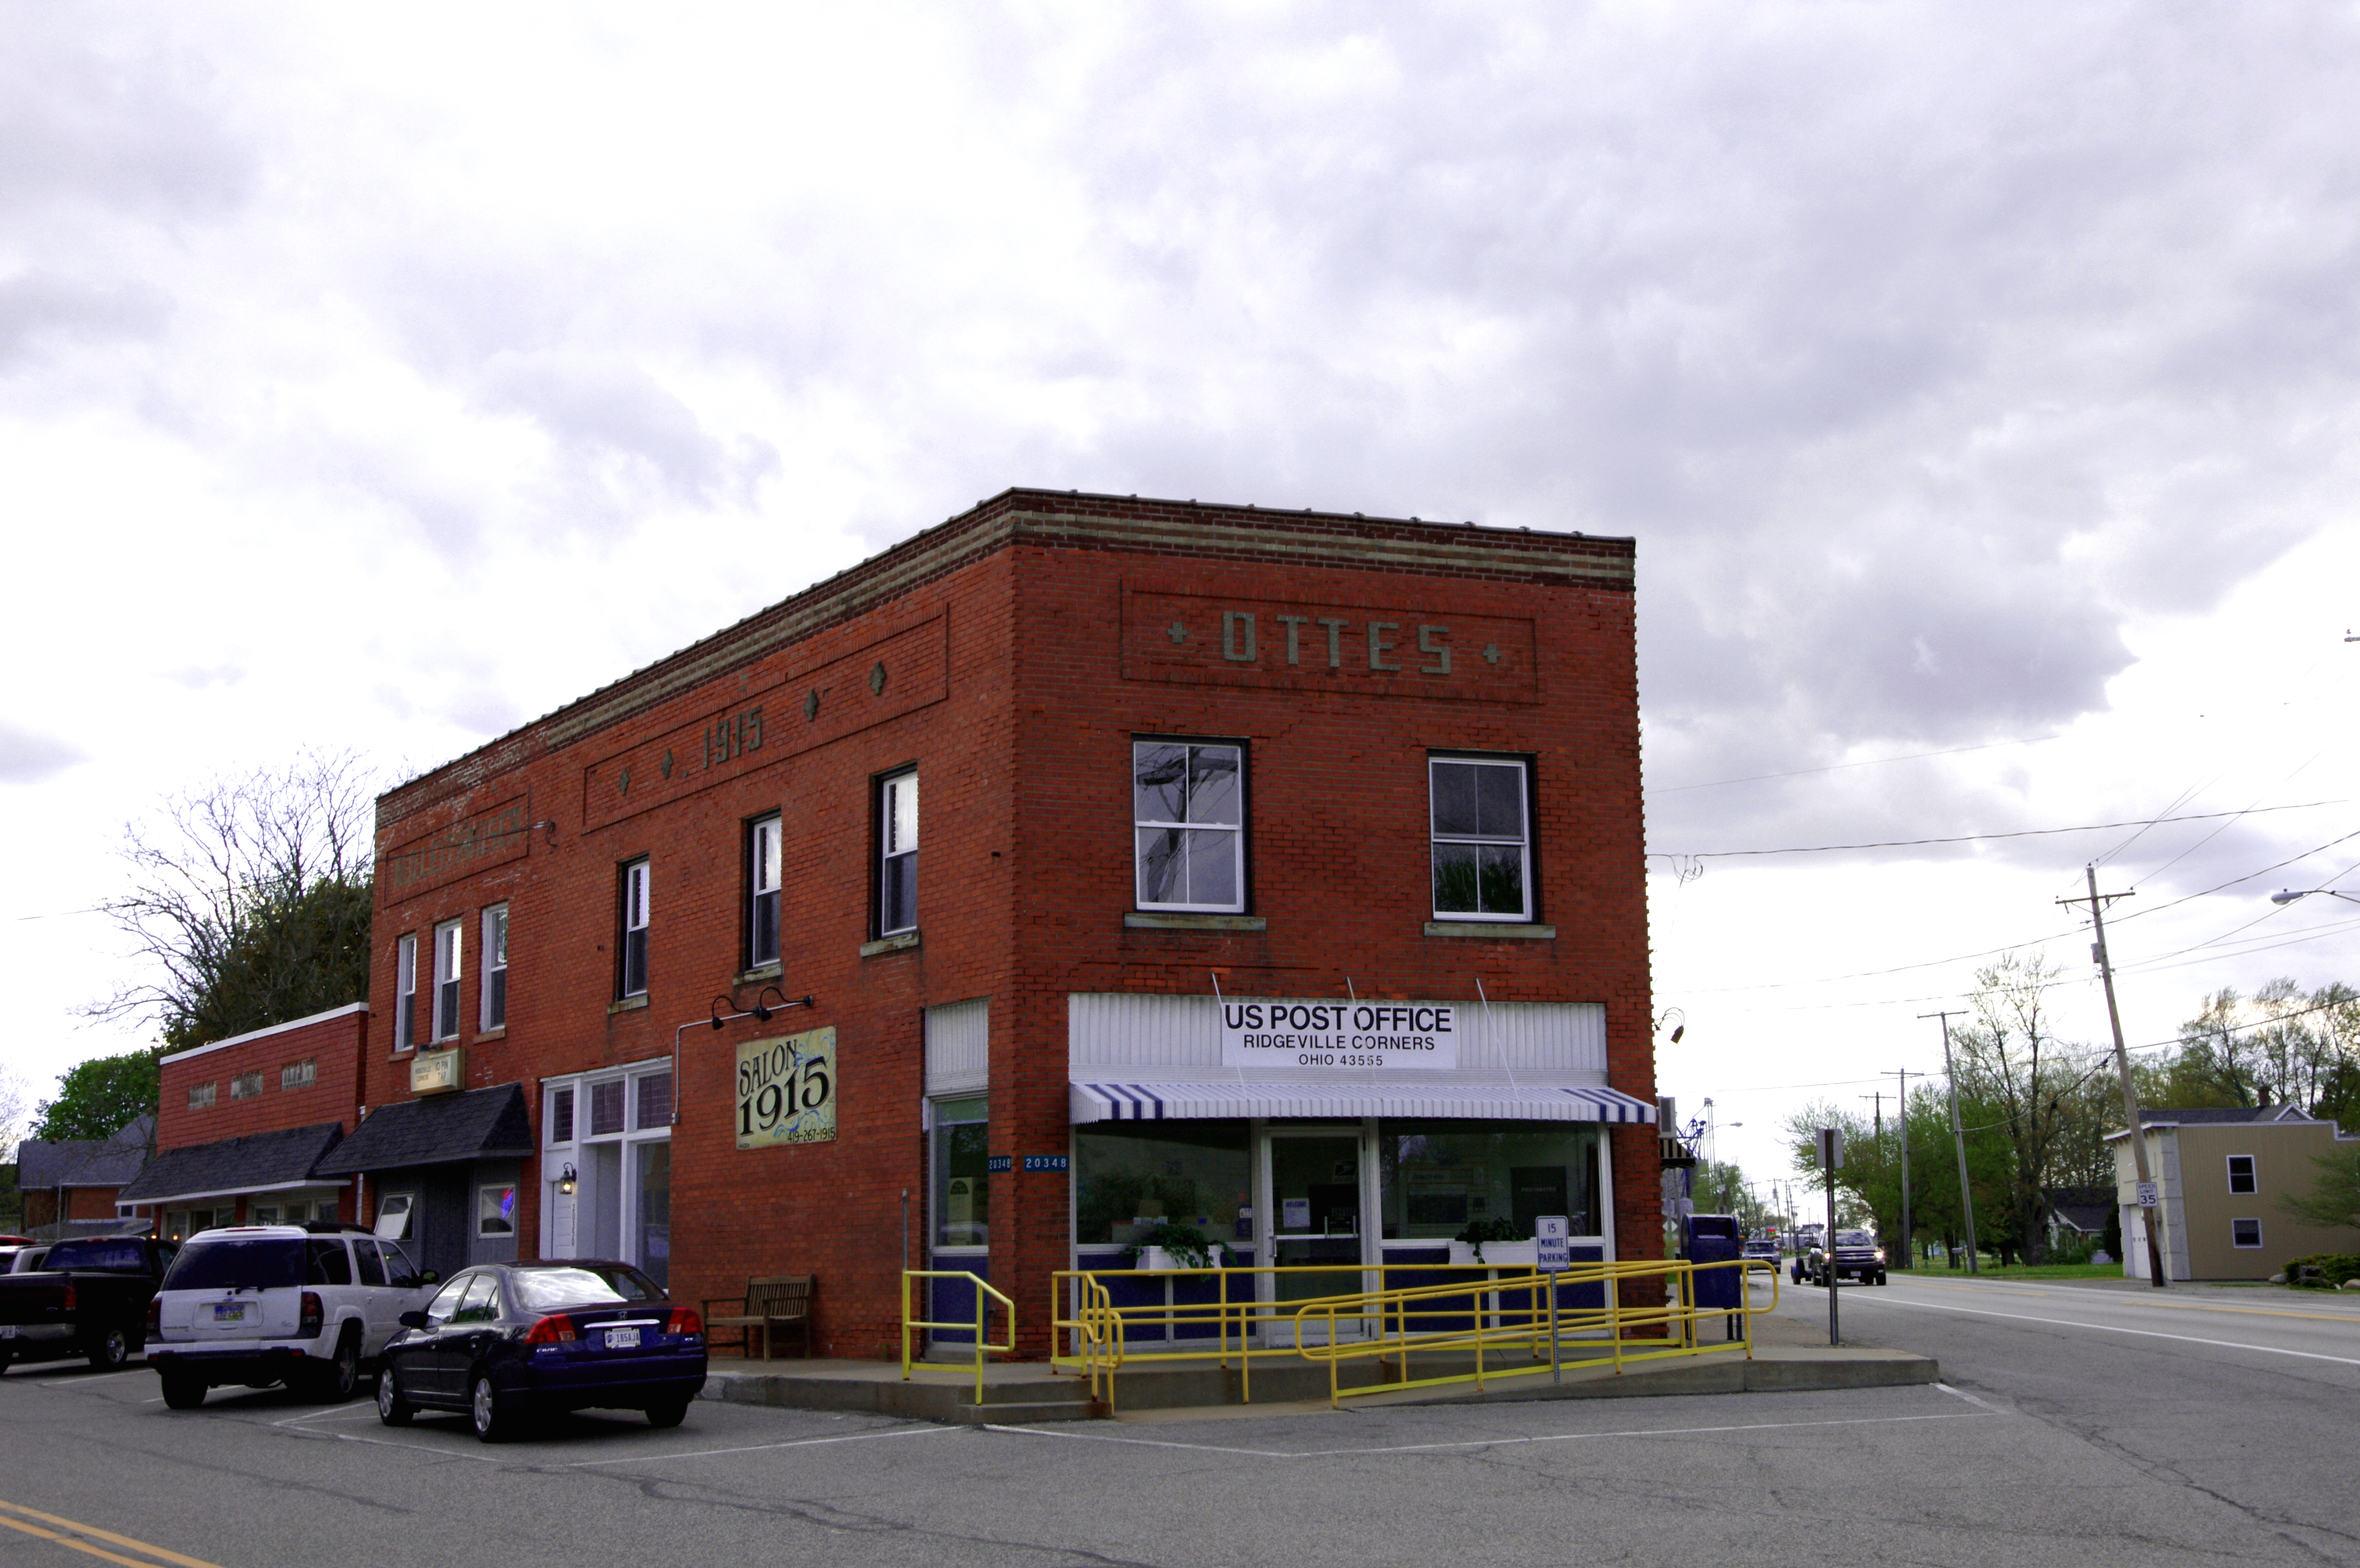 Ohio henry county ridgeville corners - File Ridgeville Corners Post Office Png